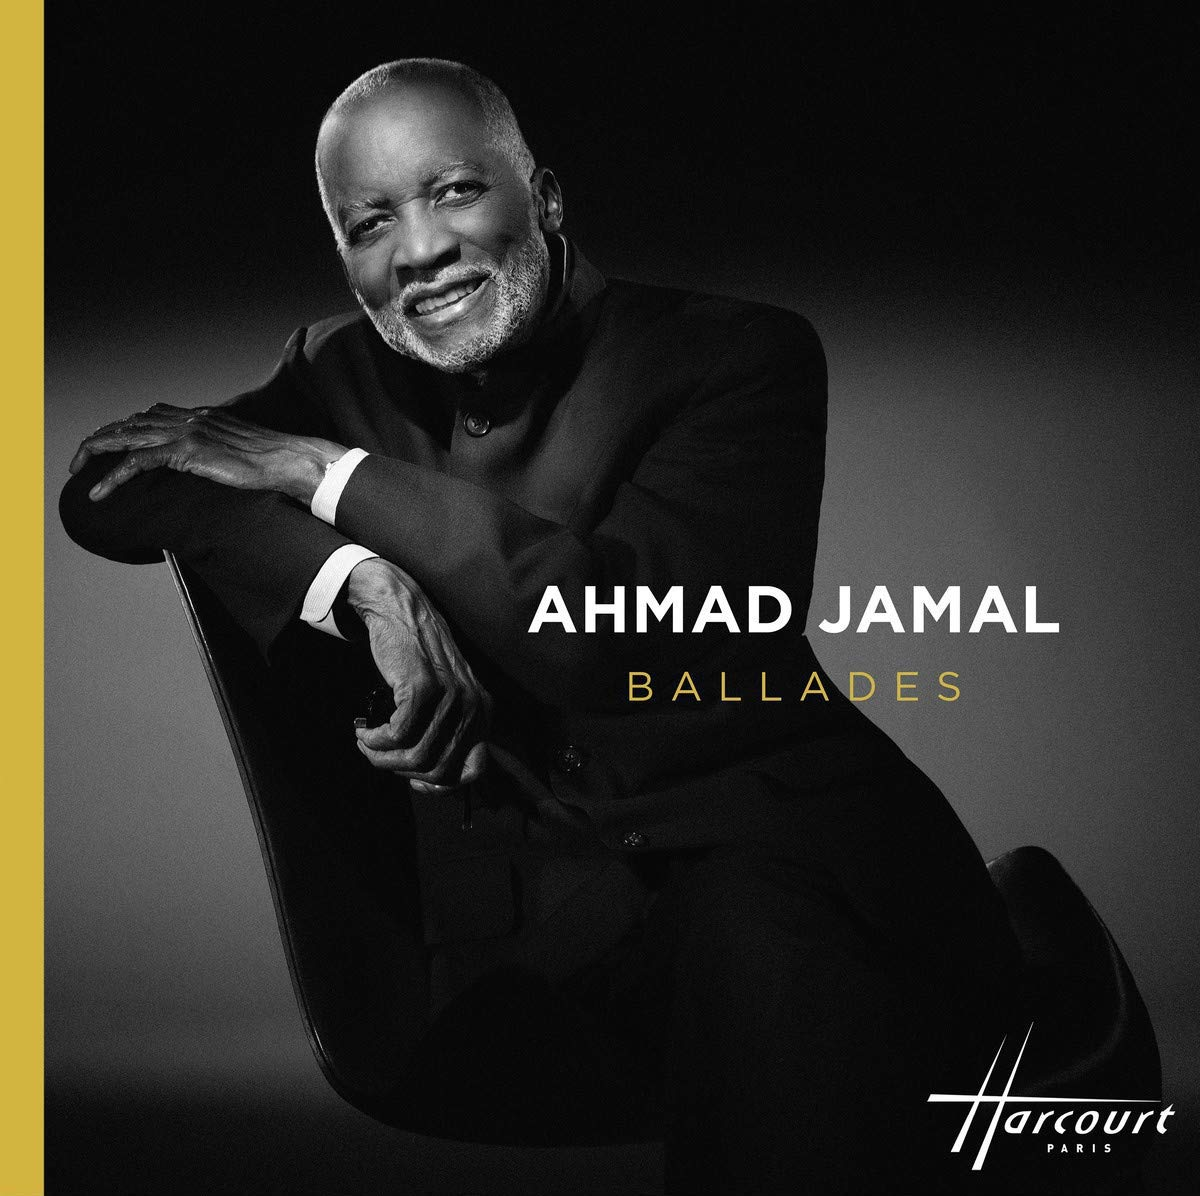 Ahmad Jamal - Ballades - Amazon.com Music